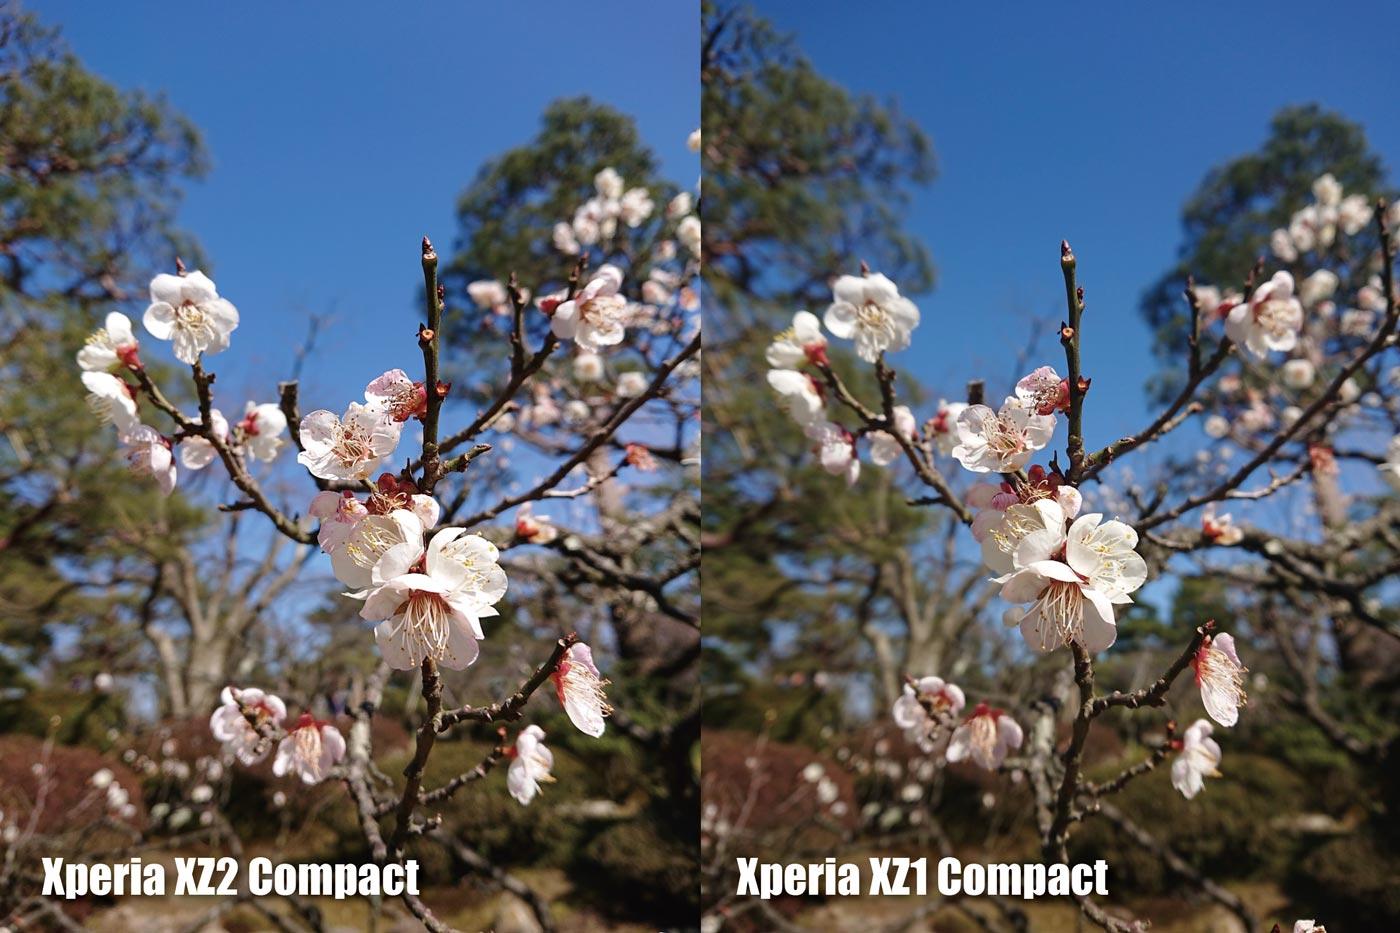 Xperia XZ2 Compact vs XZ2 Compact メインカメラの画質